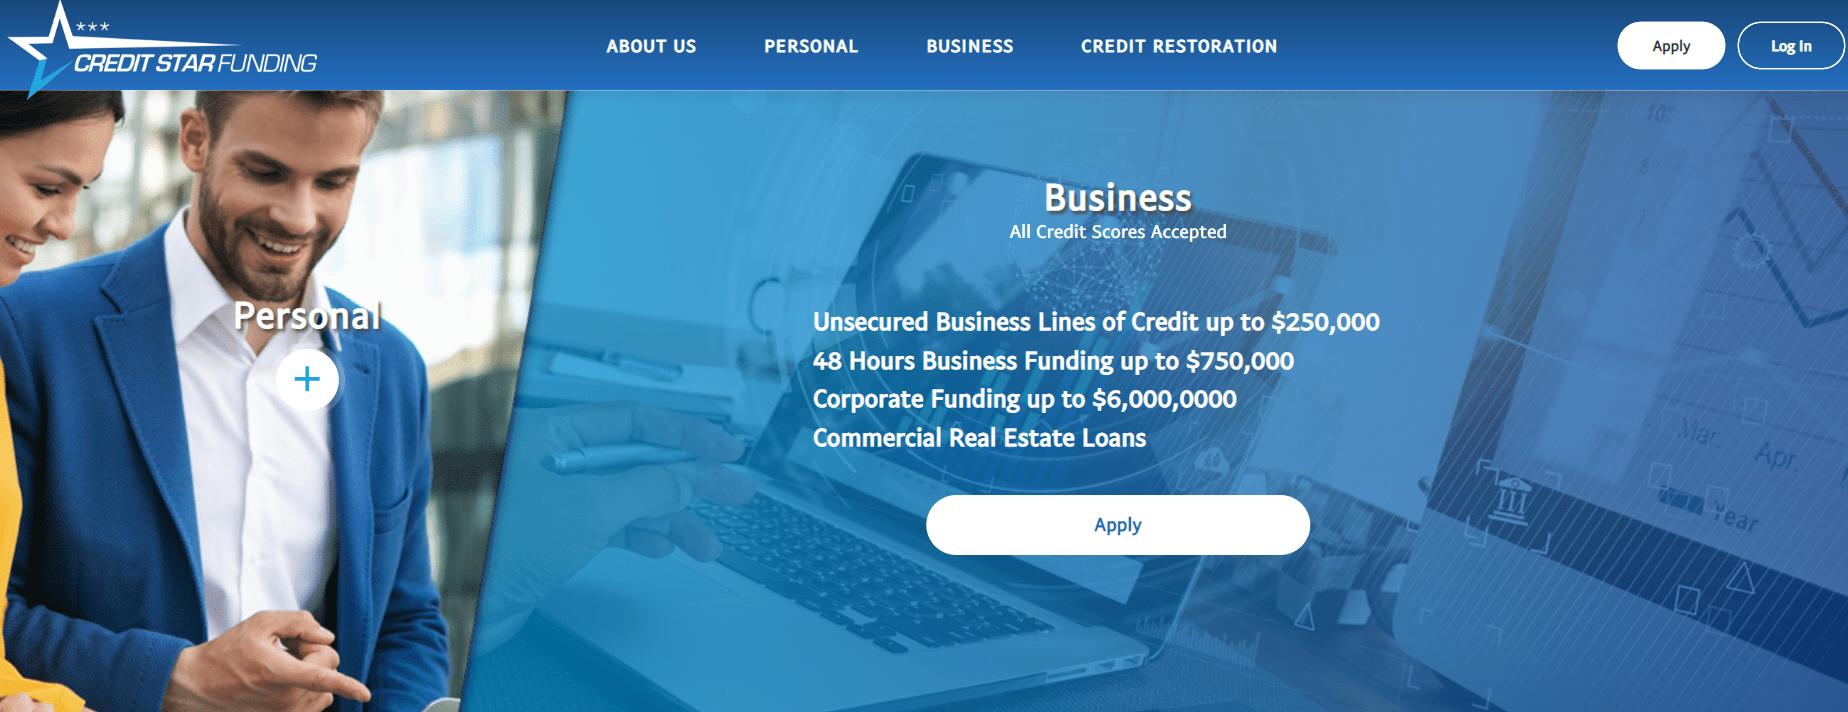 credit star funding website